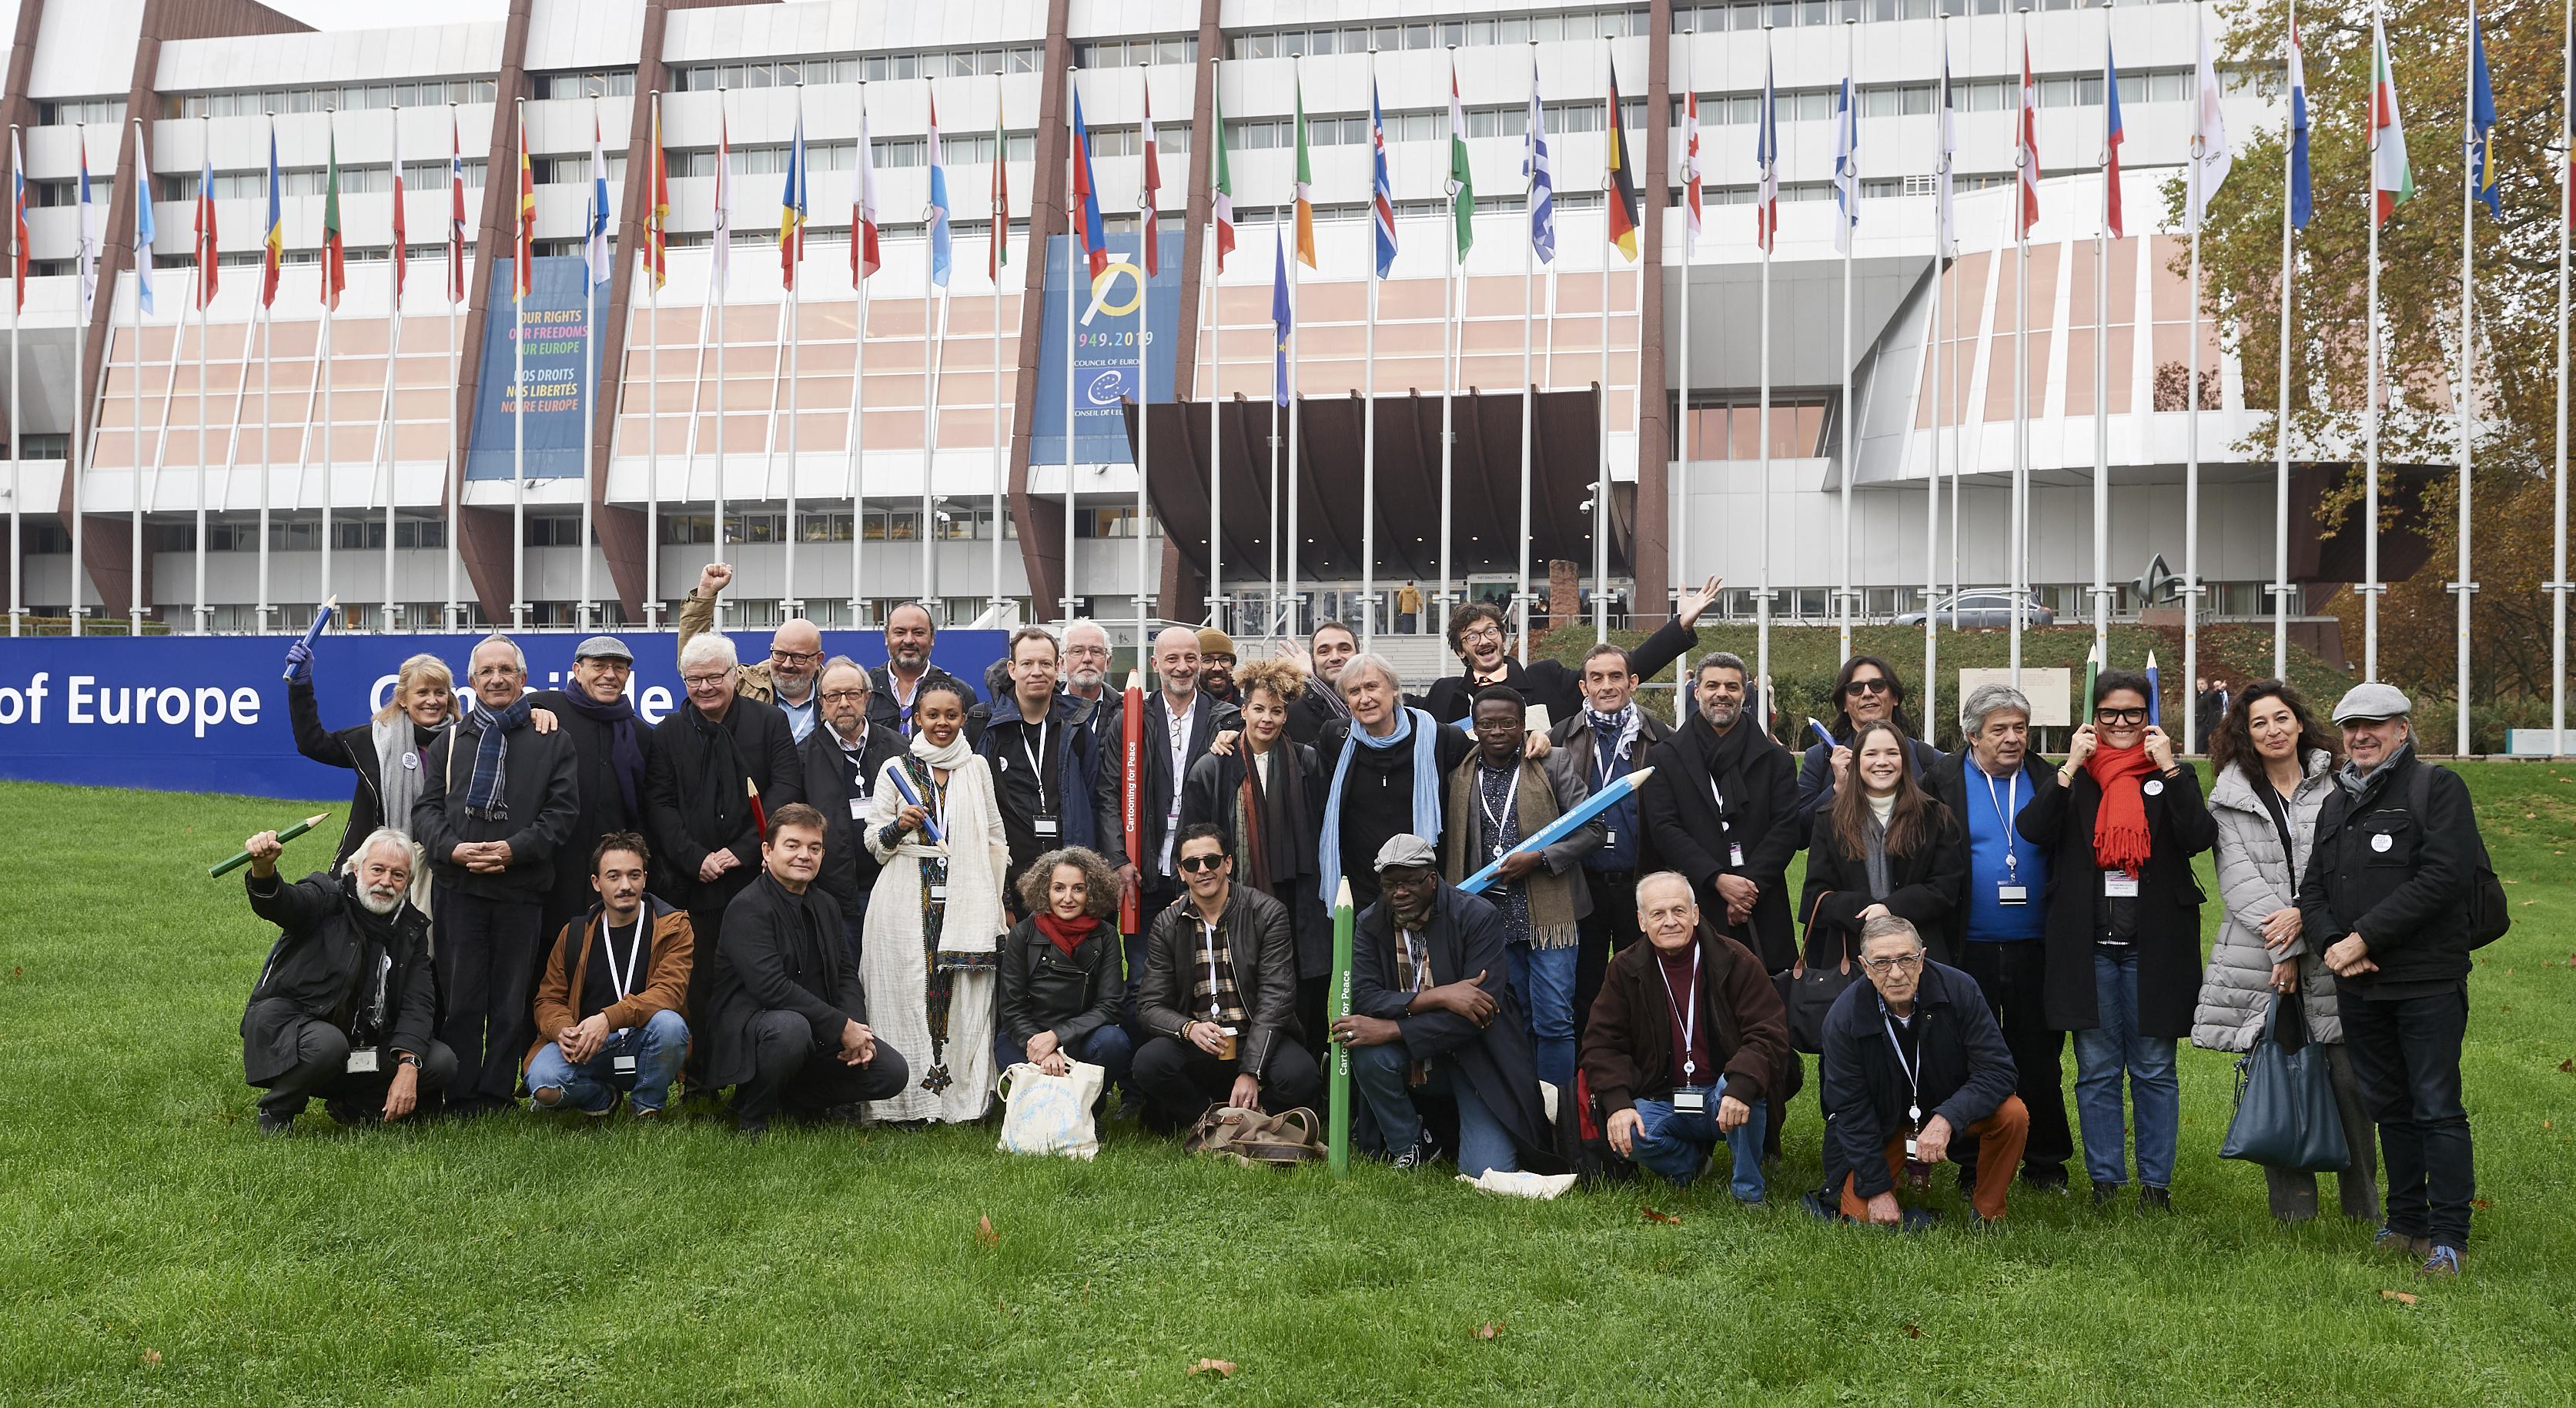 29 Sandro Weltin – Council of Europe